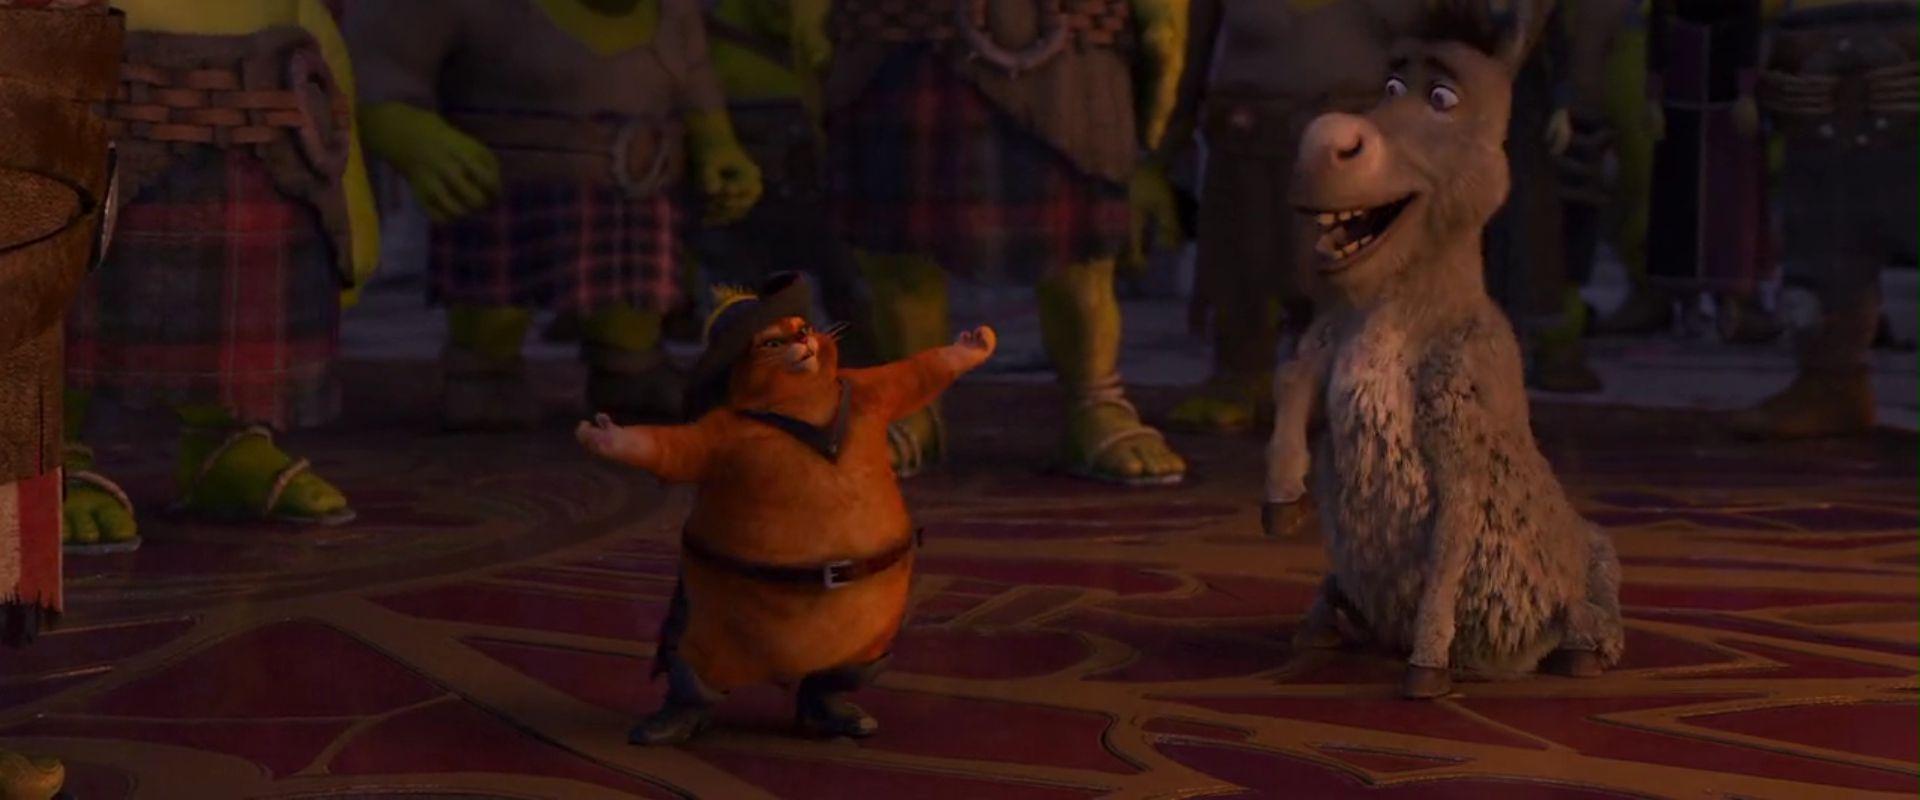 Shrek porn pics adult movie